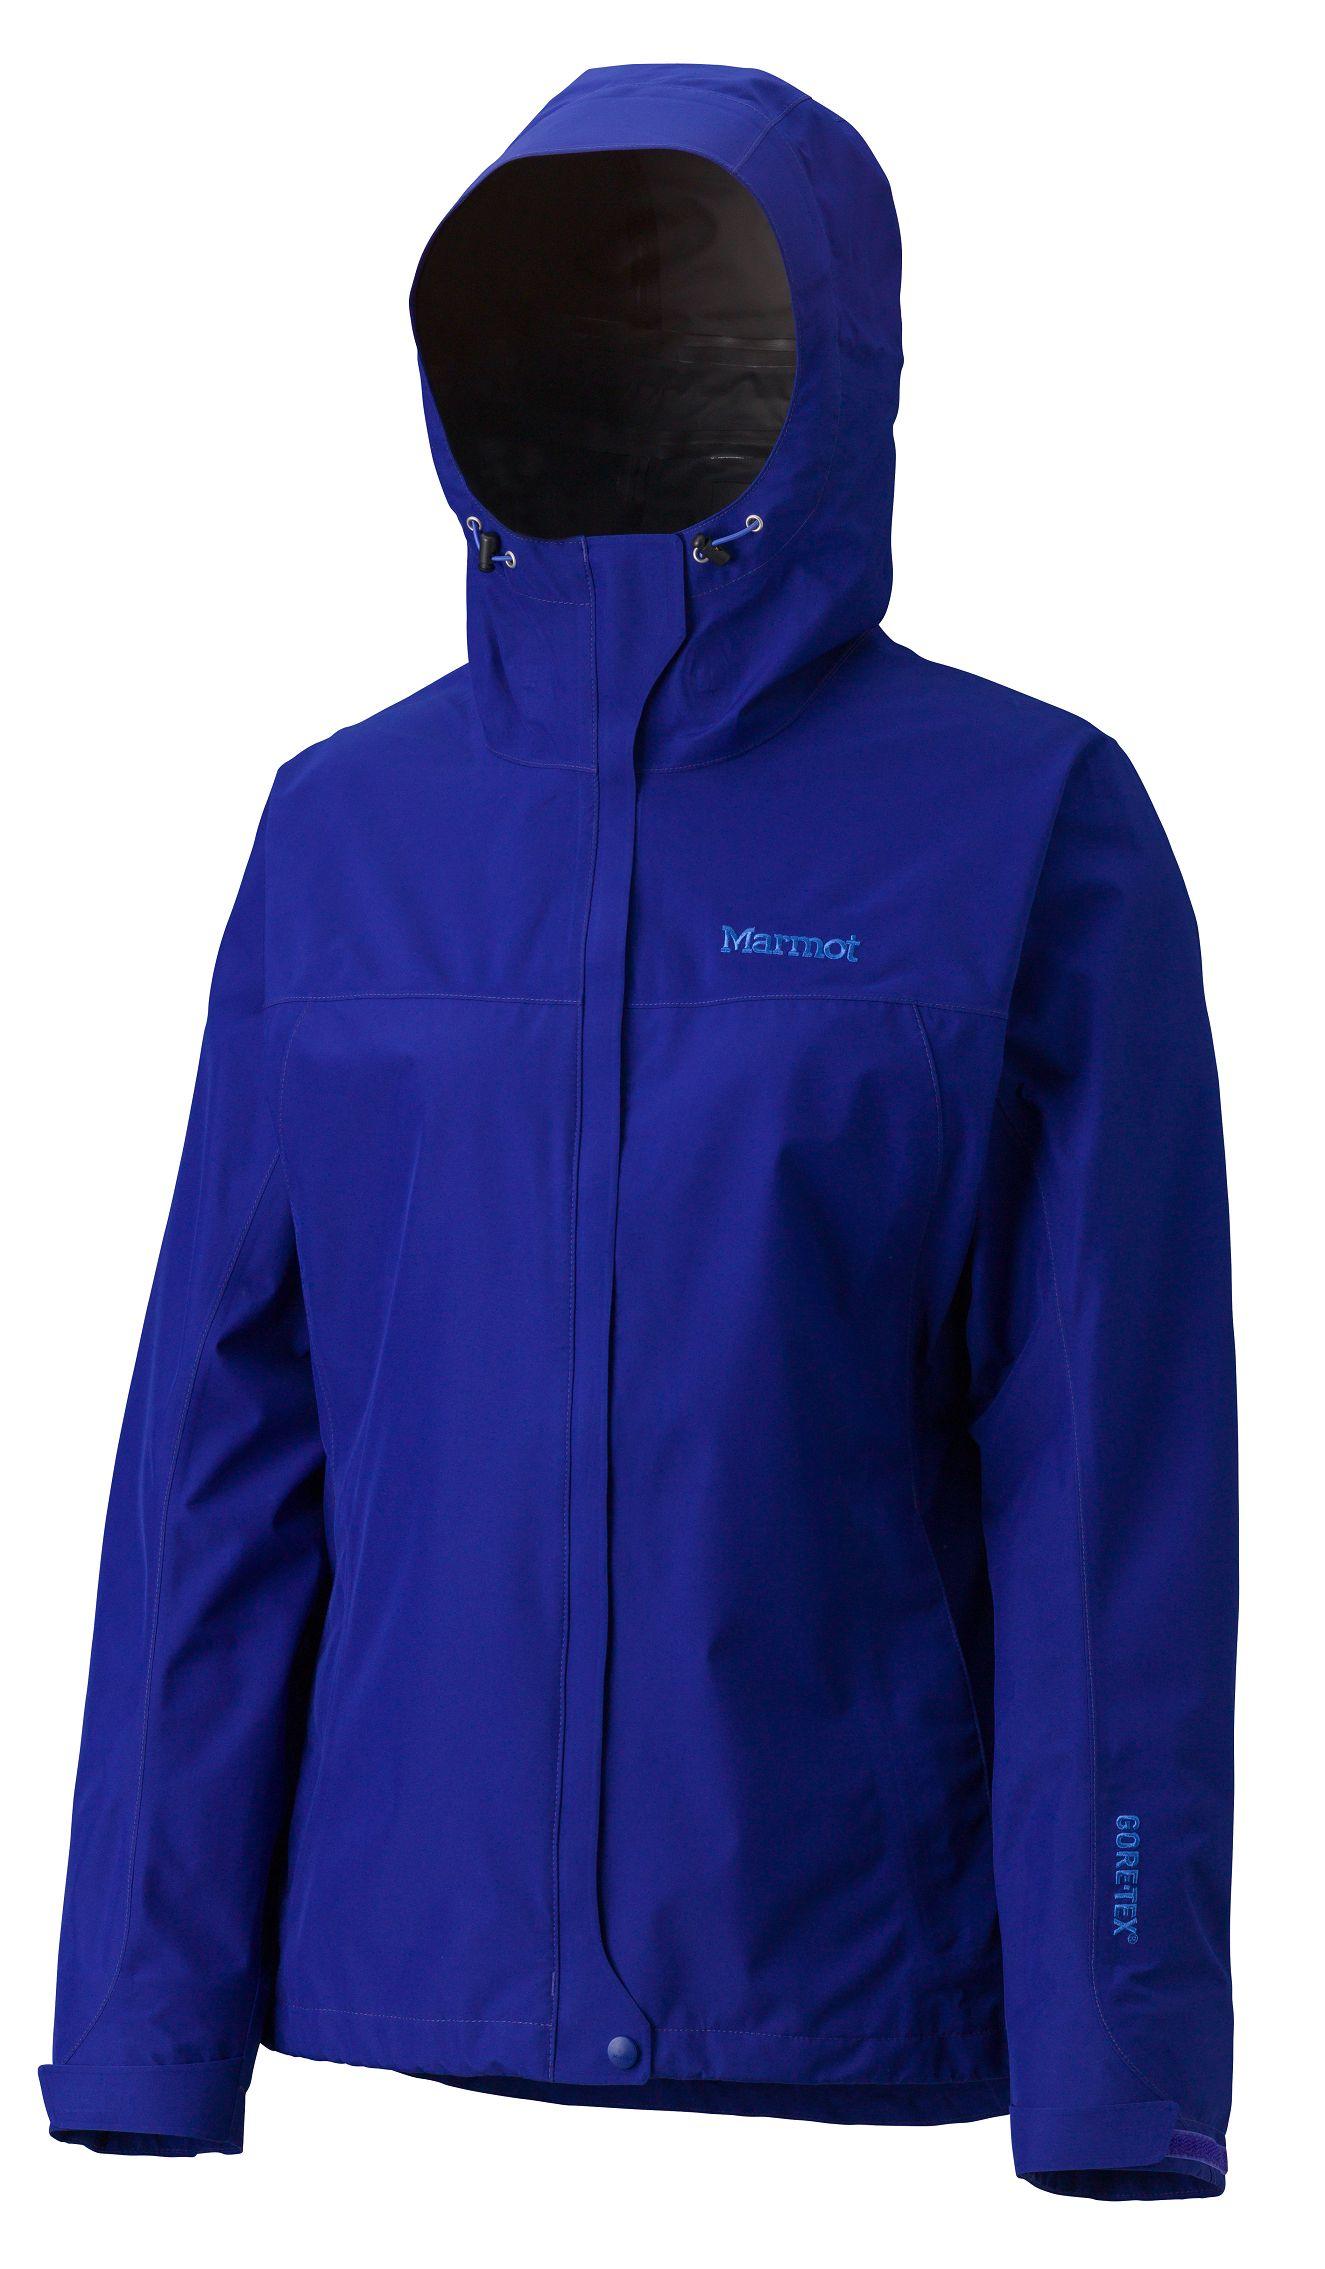 Marmot Wm's Minimalist Jacket Midnight Purple-30